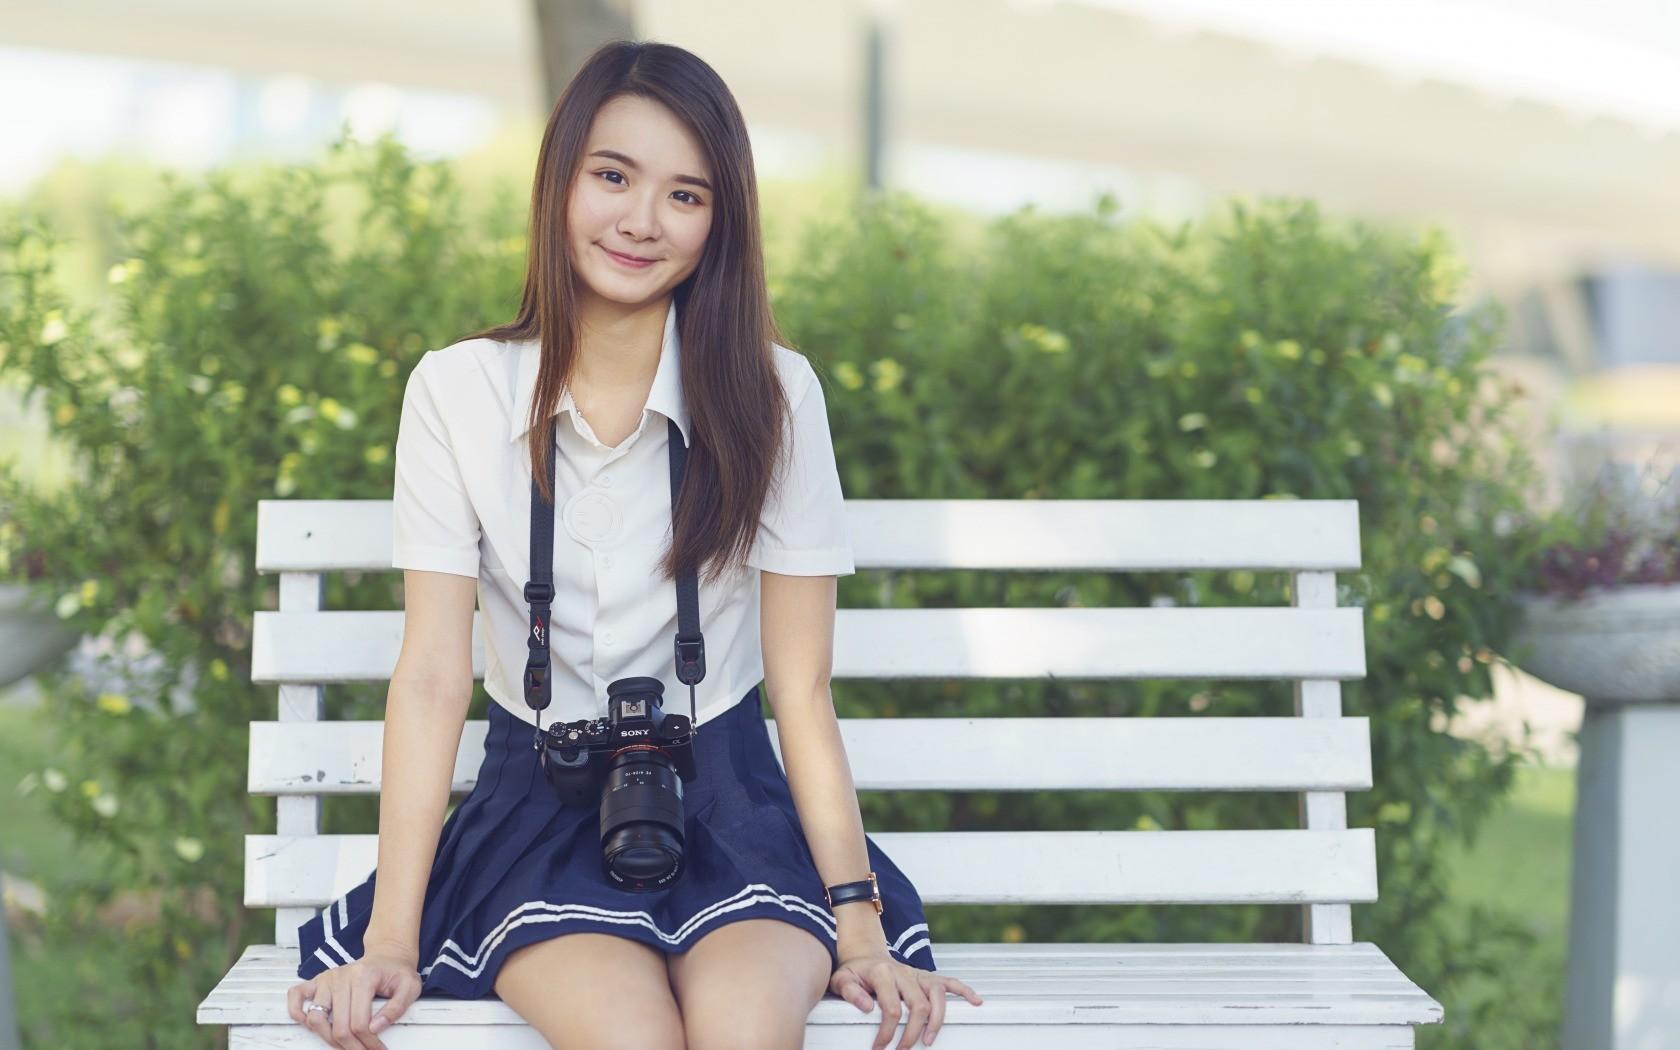 People 1680x1050 bench camera smiling Asian women outdoors schoolgirl skirt Jowyn Chow